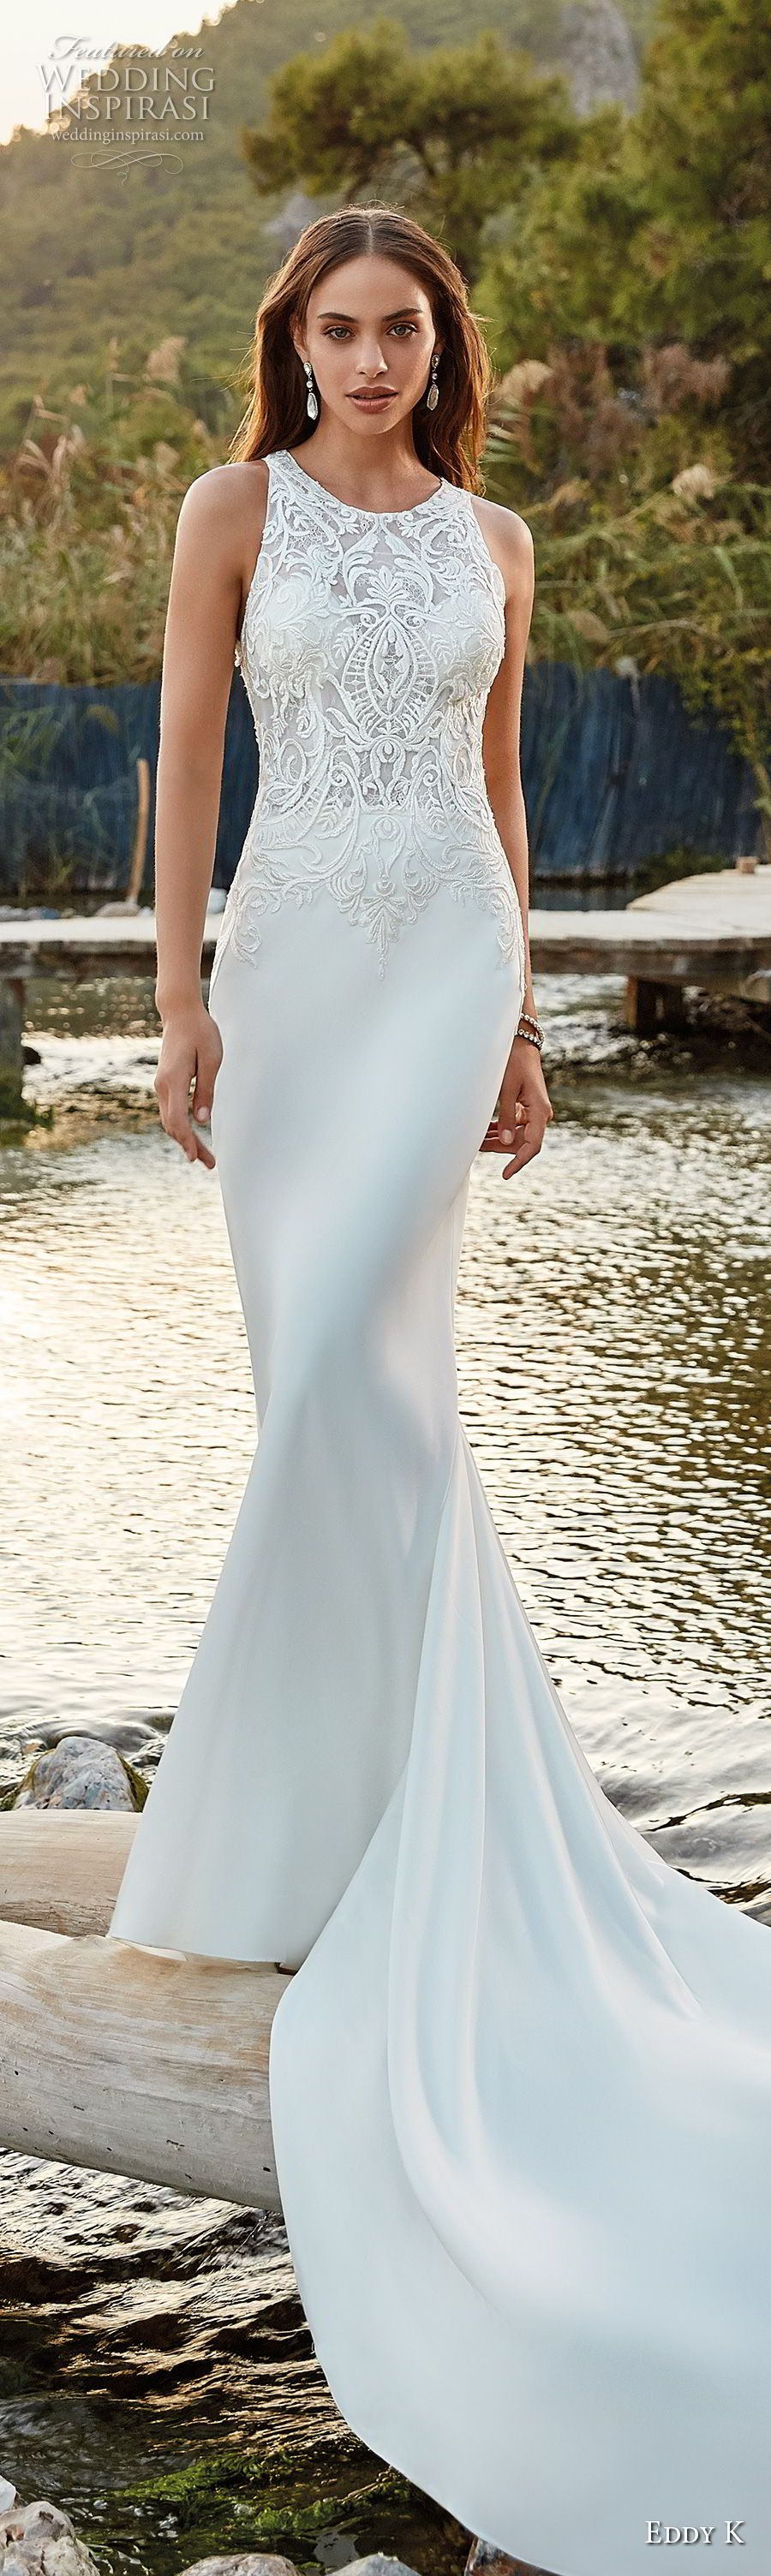 Eddy K. Dreams 2019 Wedding Dresses | Chapel train, Bodice and Jewel